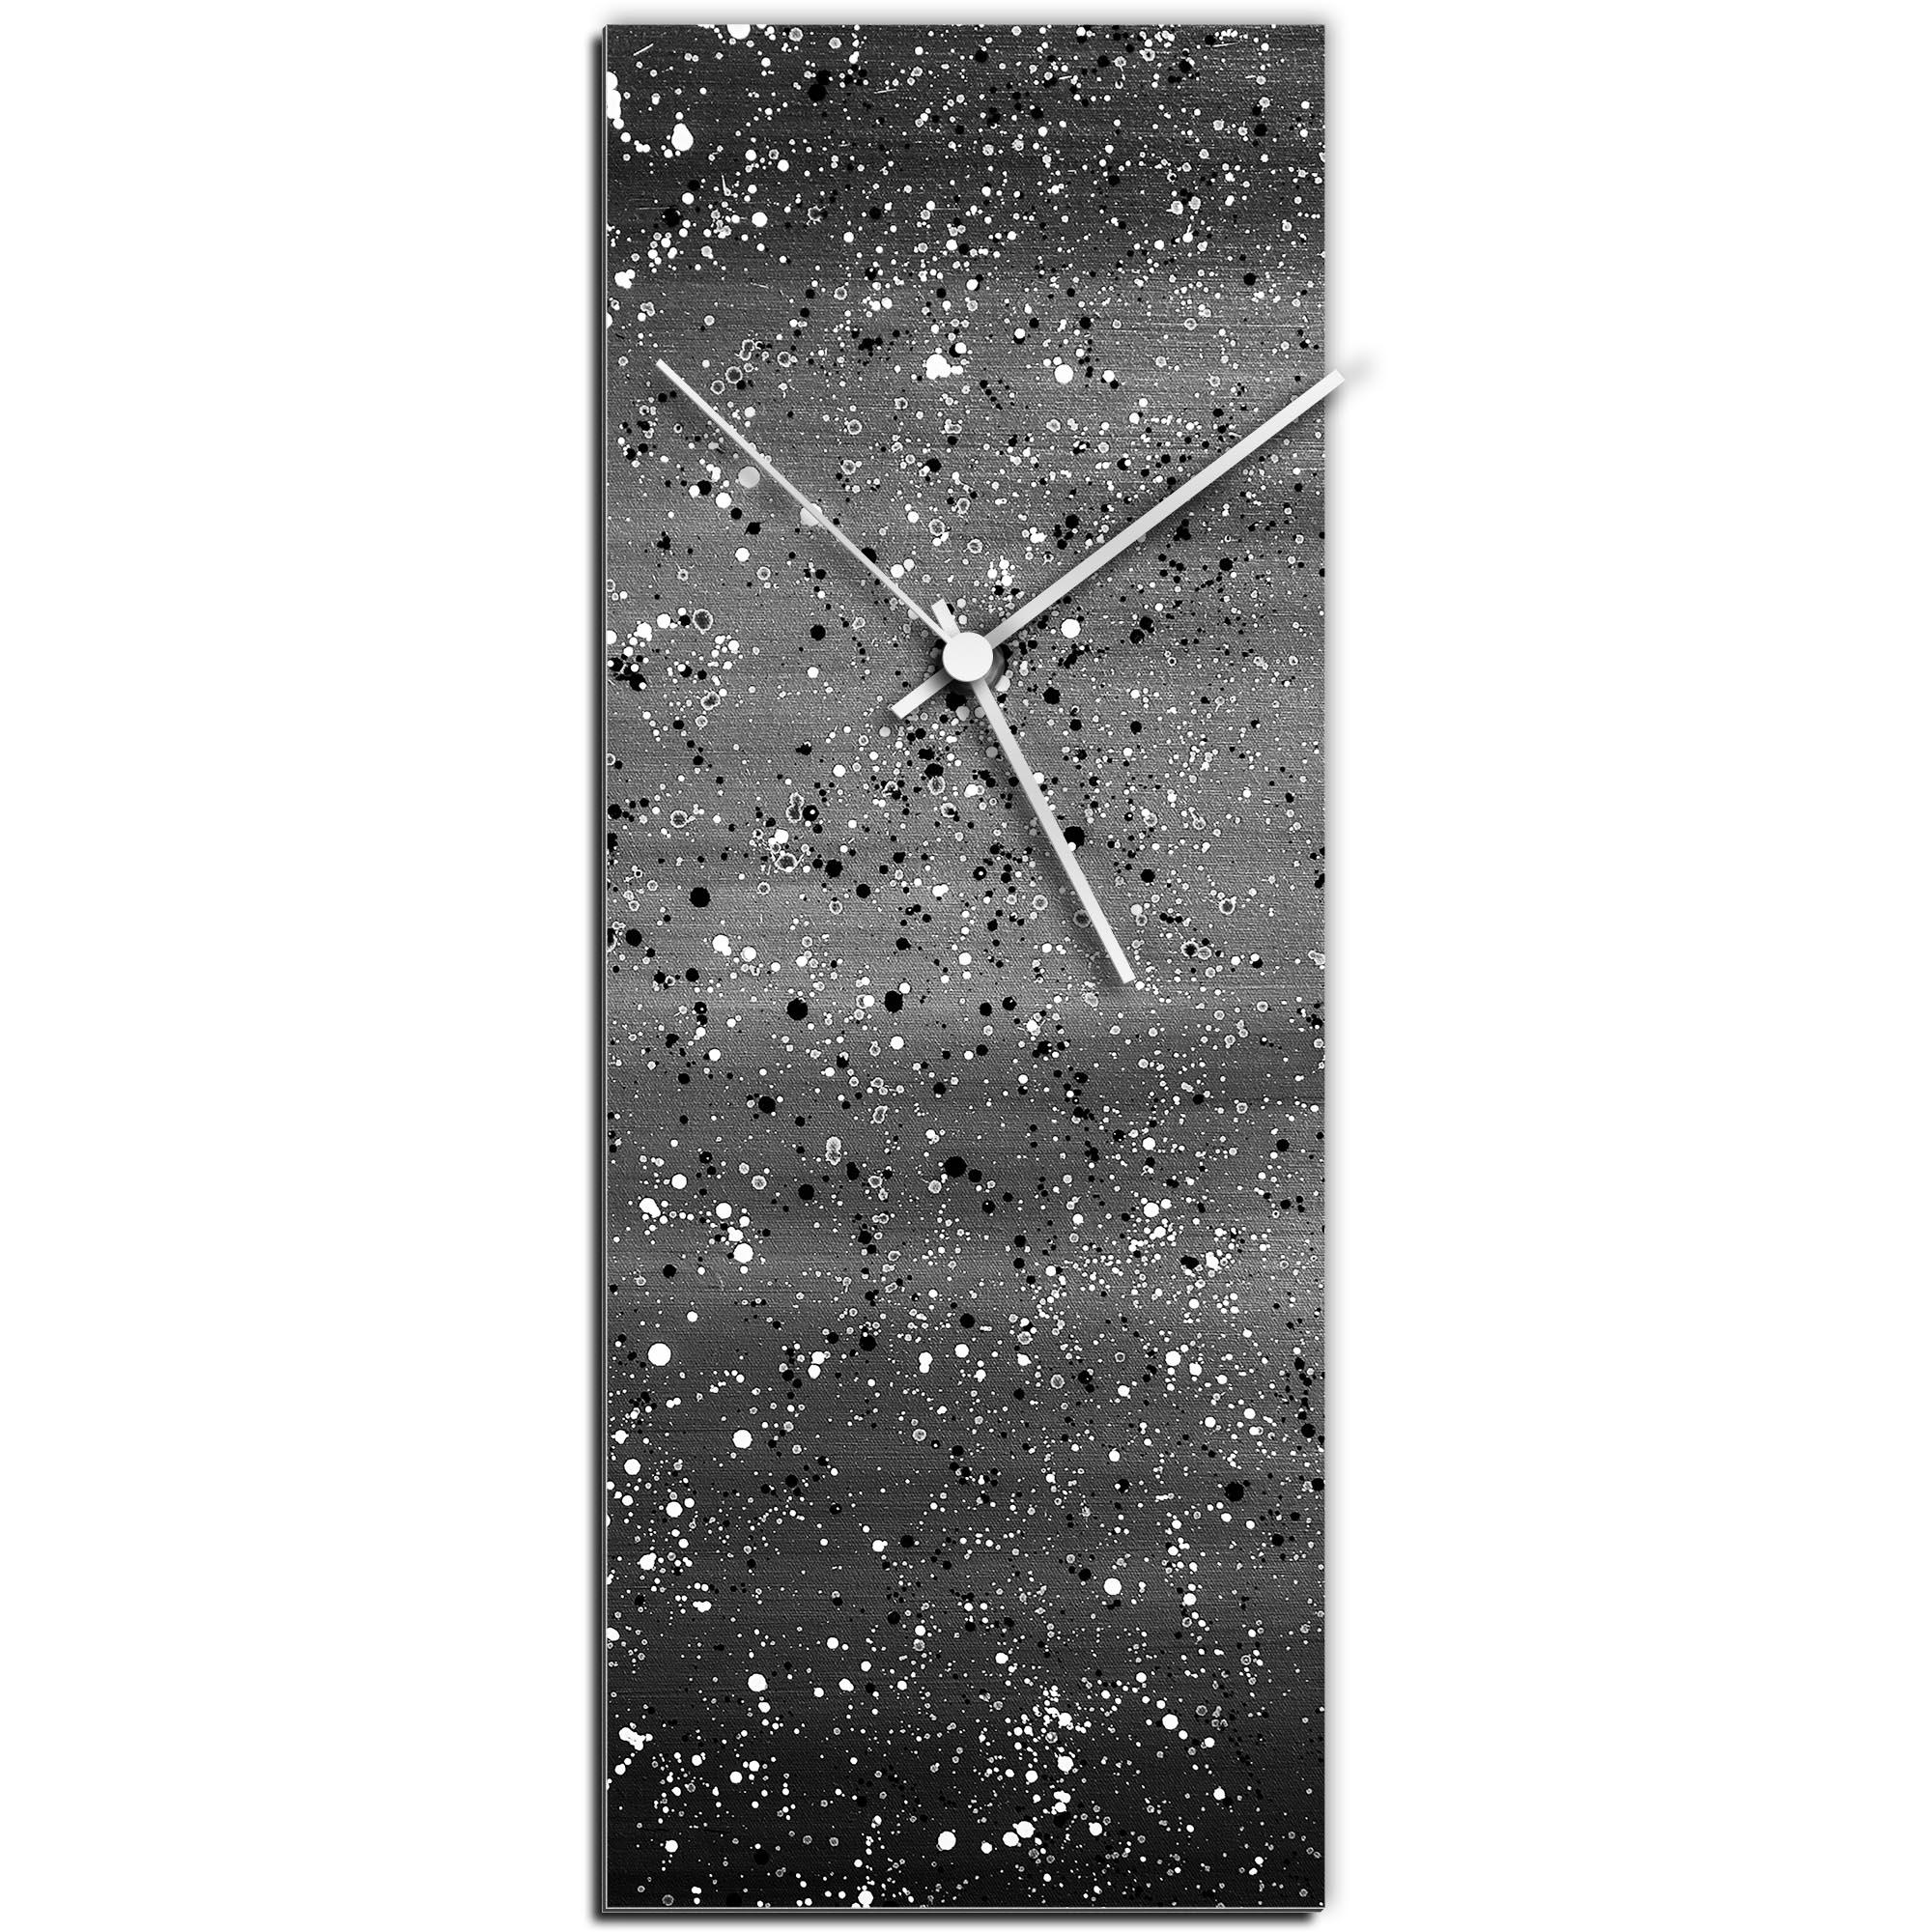 Mendo Vasilevski 'Black Flecked Clock' 6in x 16in Modern Wall Clock on Aluminum Composite